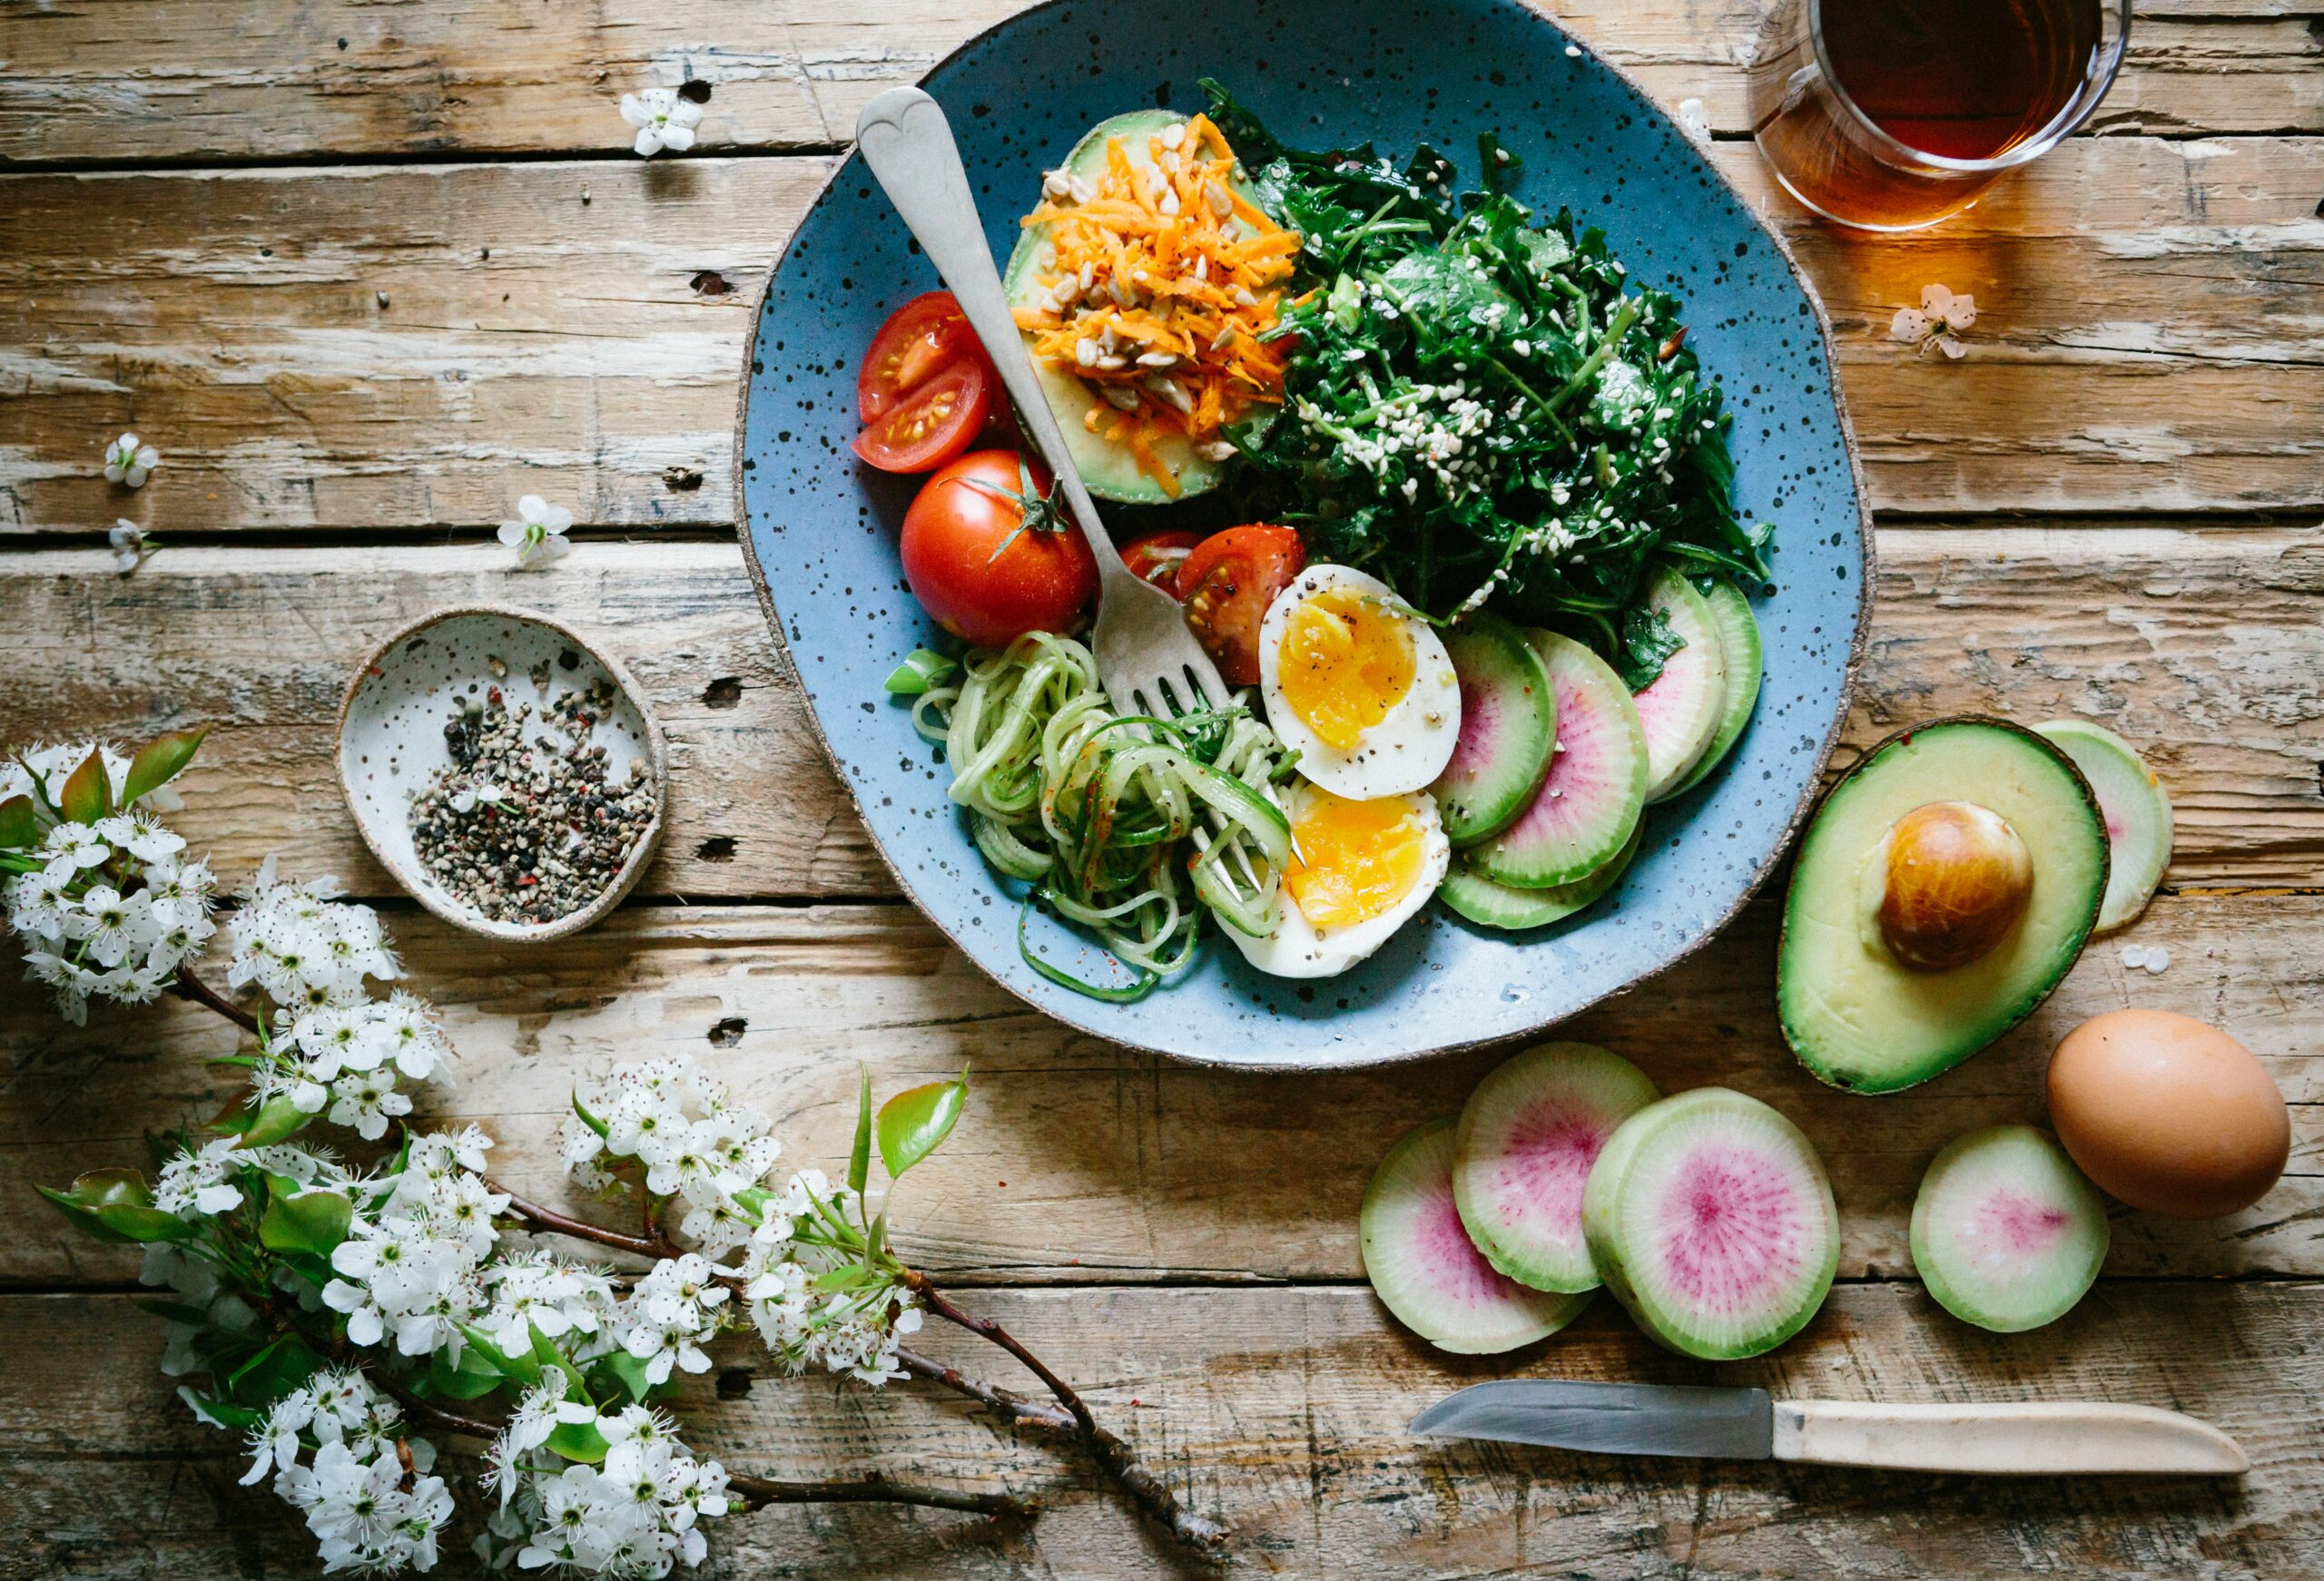 voeding sportmedisch centrum lebbeke groenten eiwitten diëtist